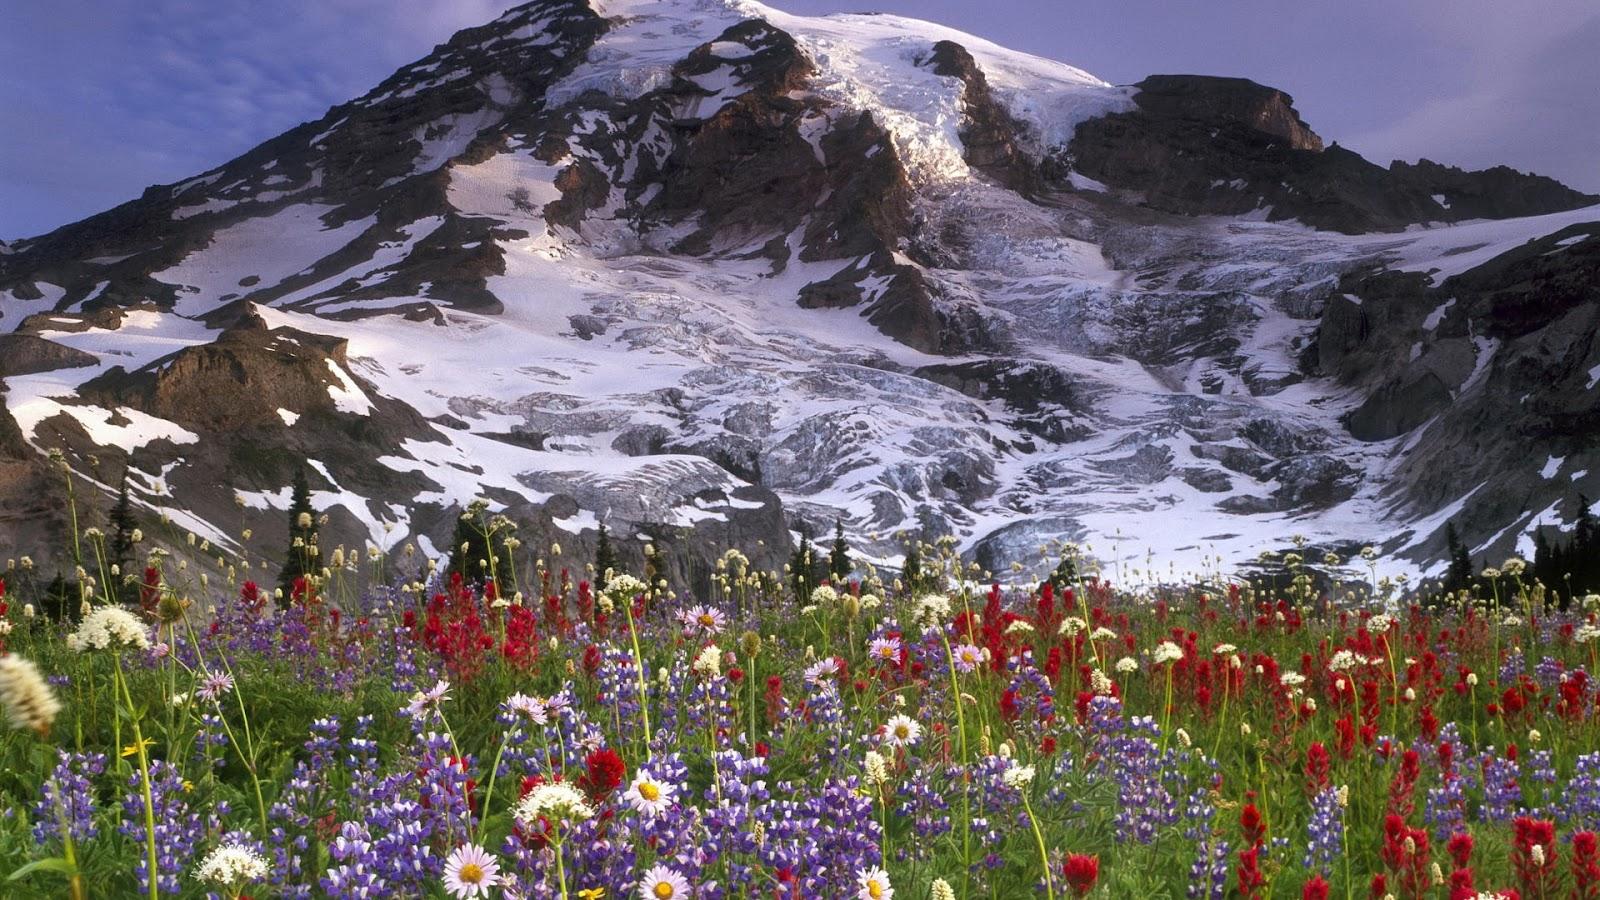 nature wallpaper full hd,mountainous landforms,natural landscape,nature,mountain,meadow